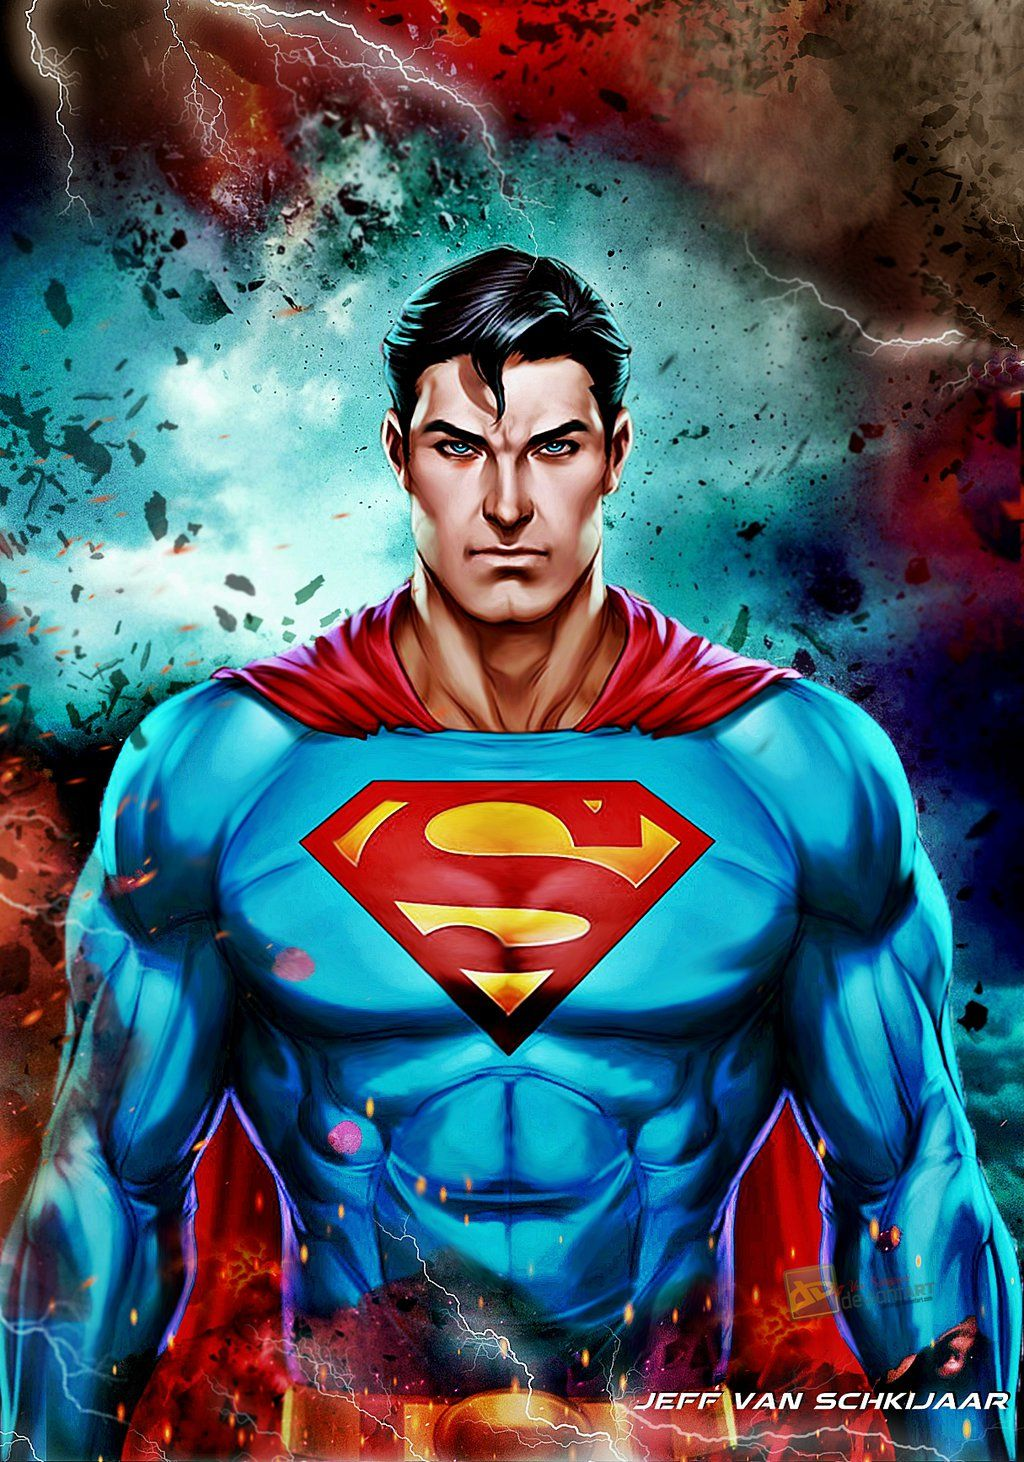 Superman Justice League Doom Poster by jeffery10 ...